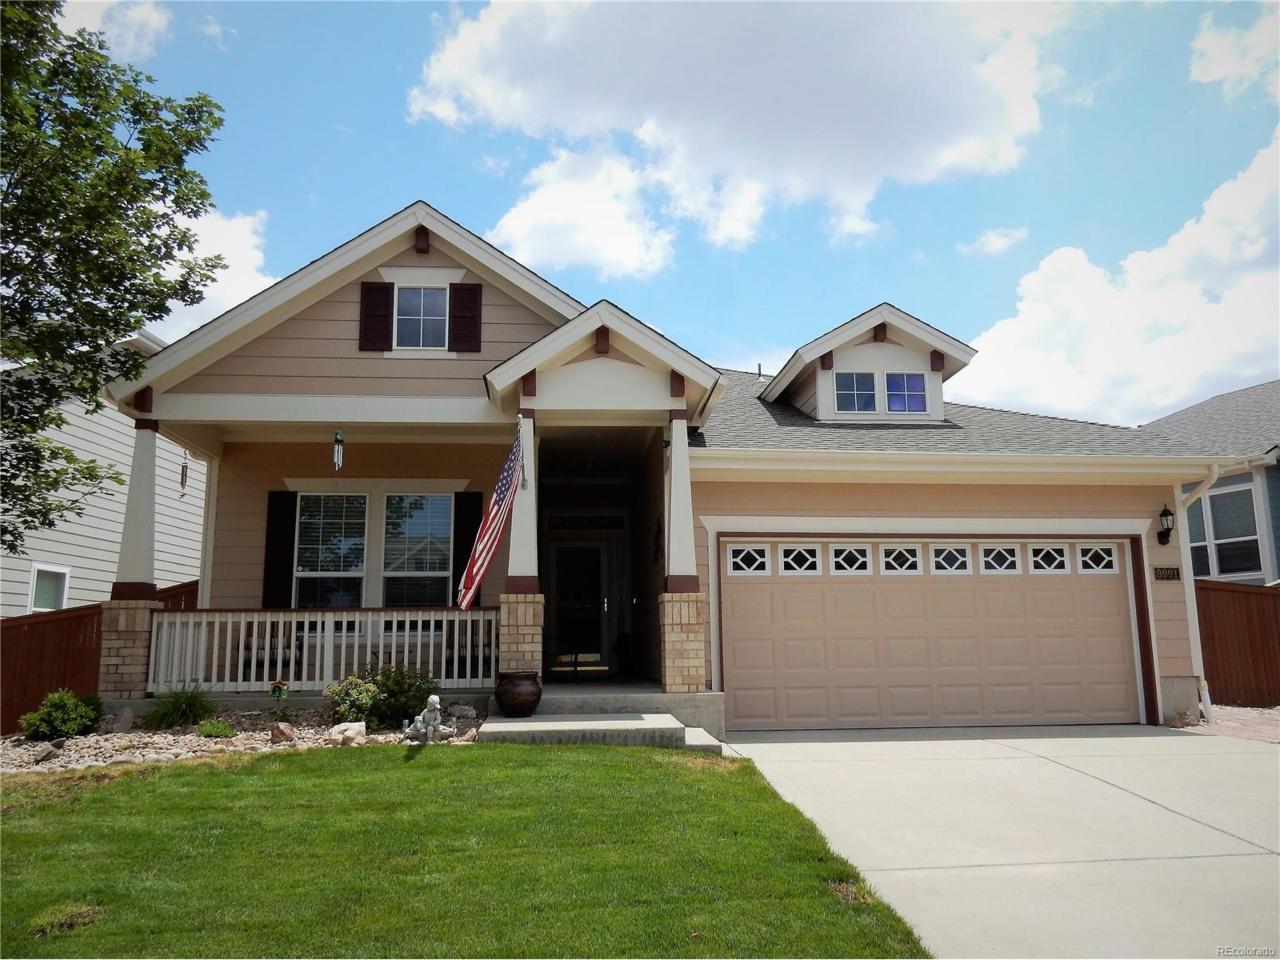 9991 Boca Circle, Parker, CO 80134 (MLS #3879124) :: 8z Real Estate